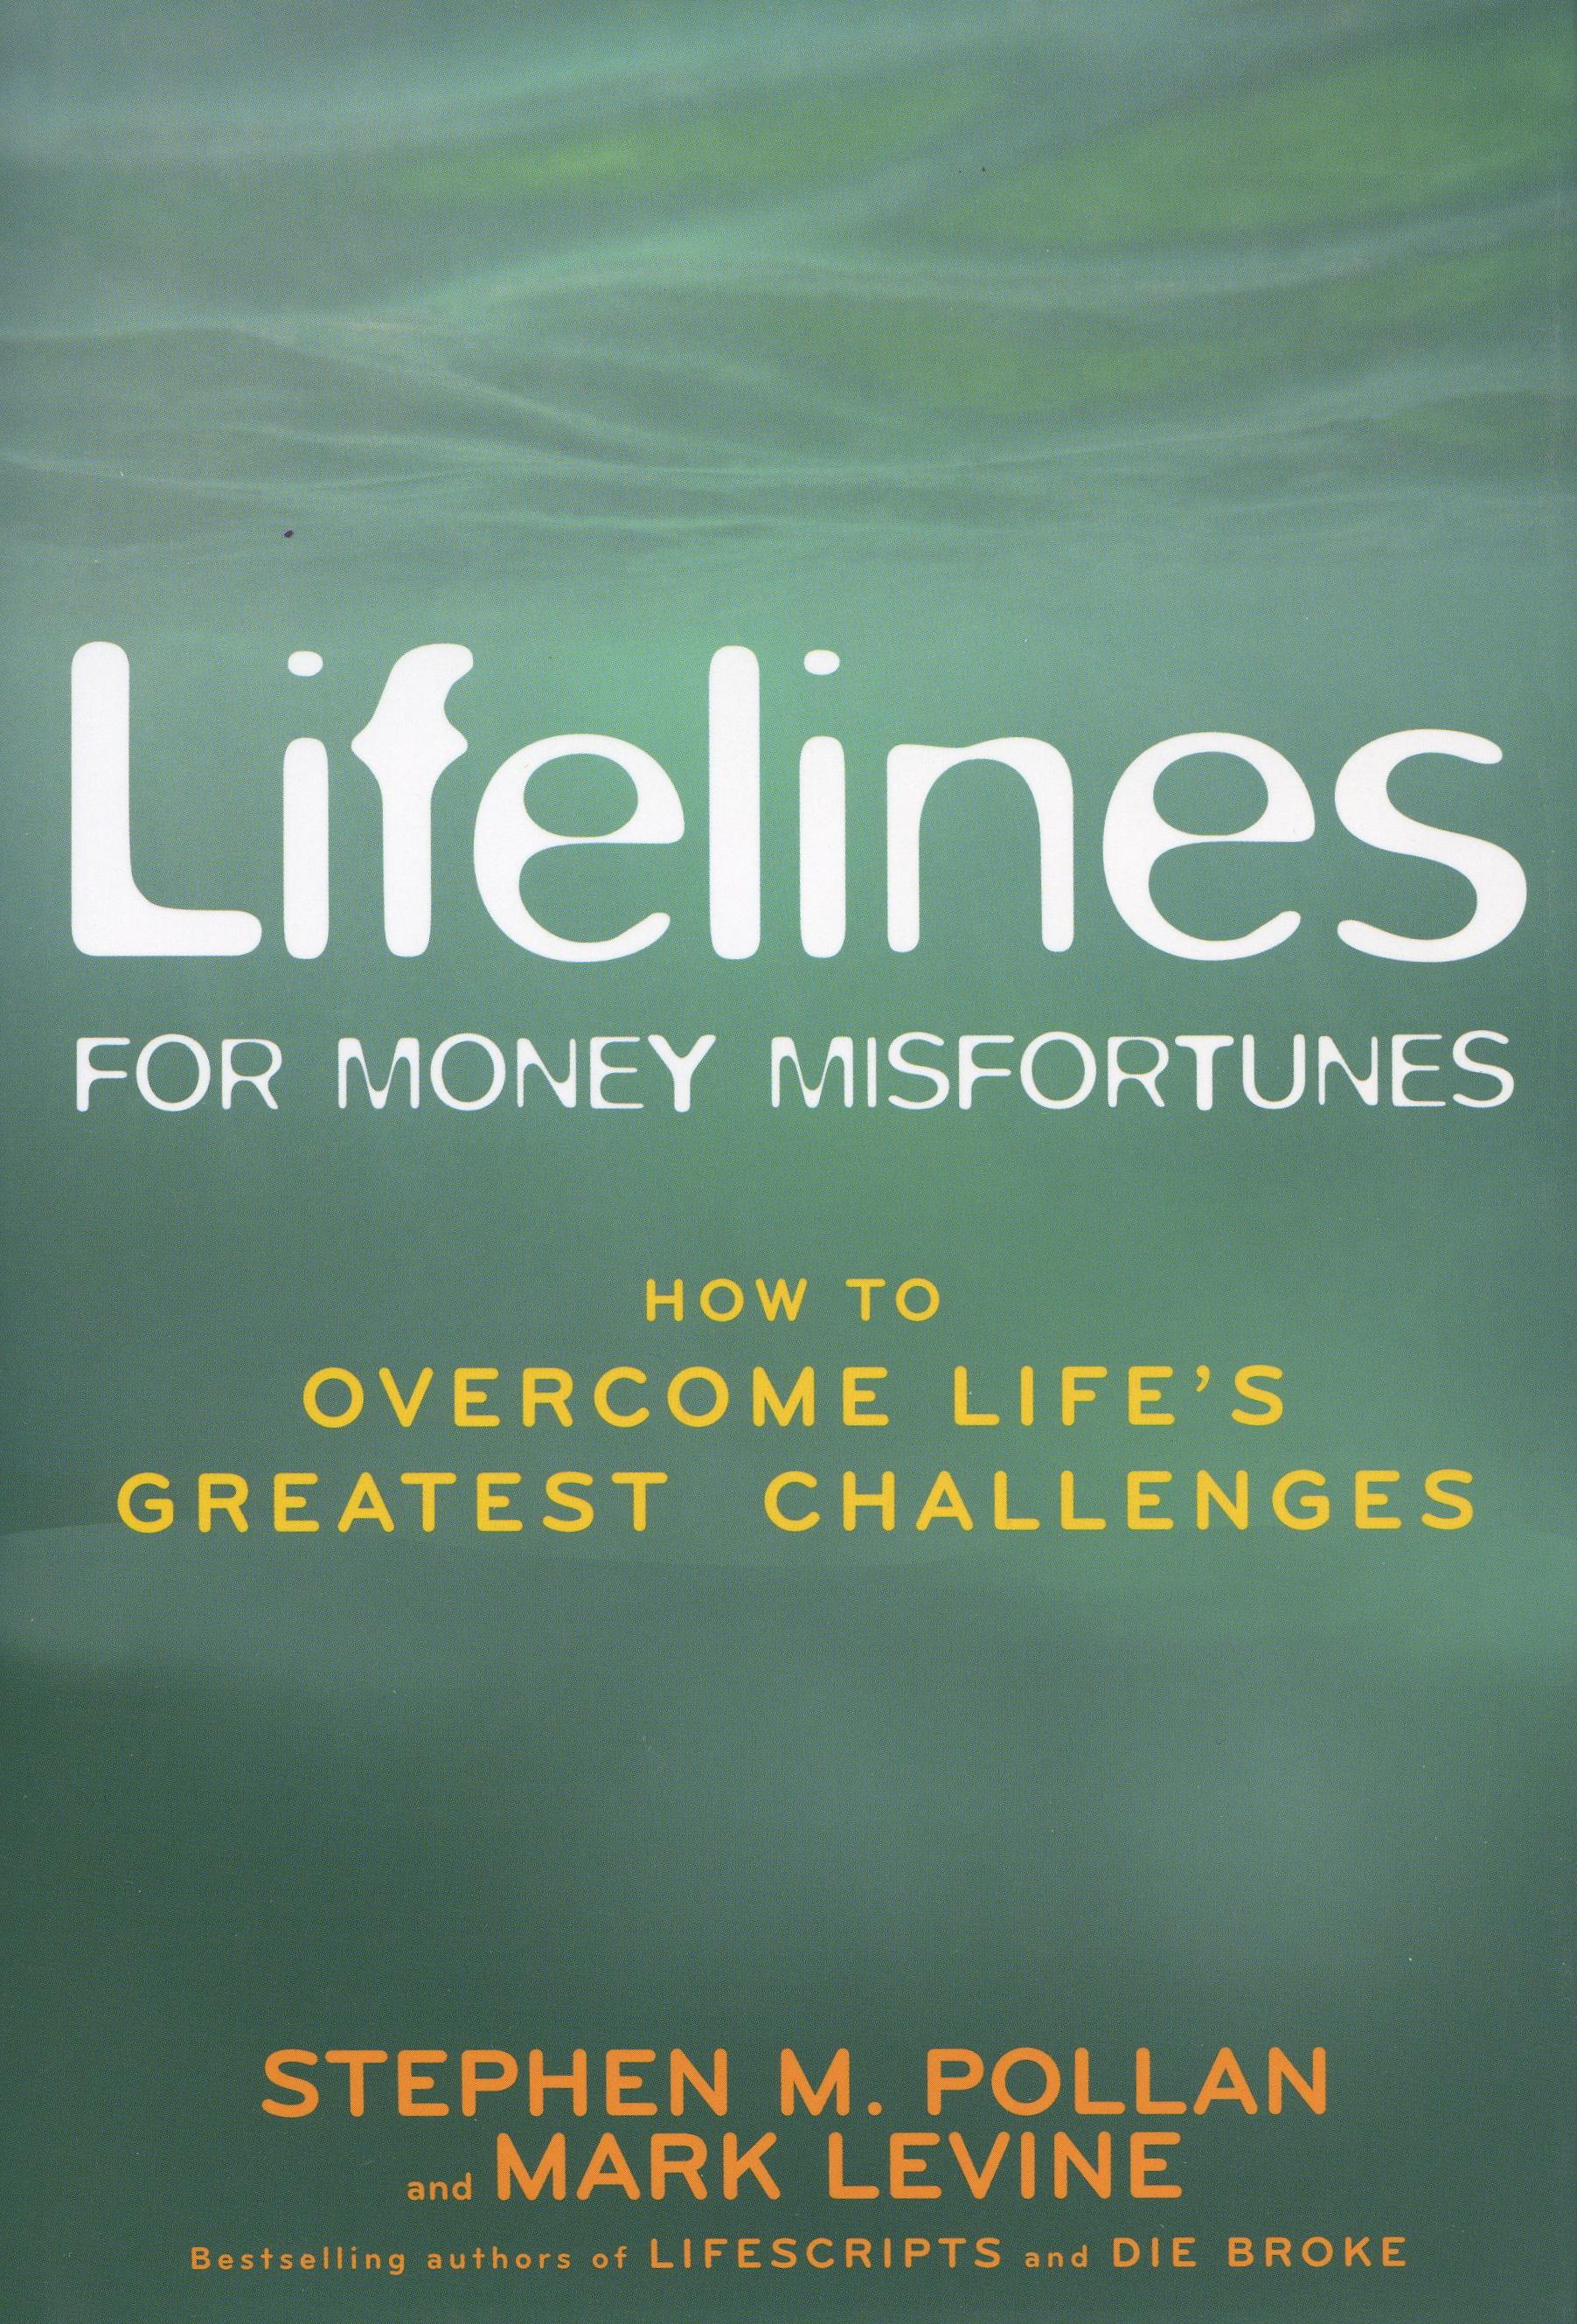 Lifelines For Money Misfortunes.jpg